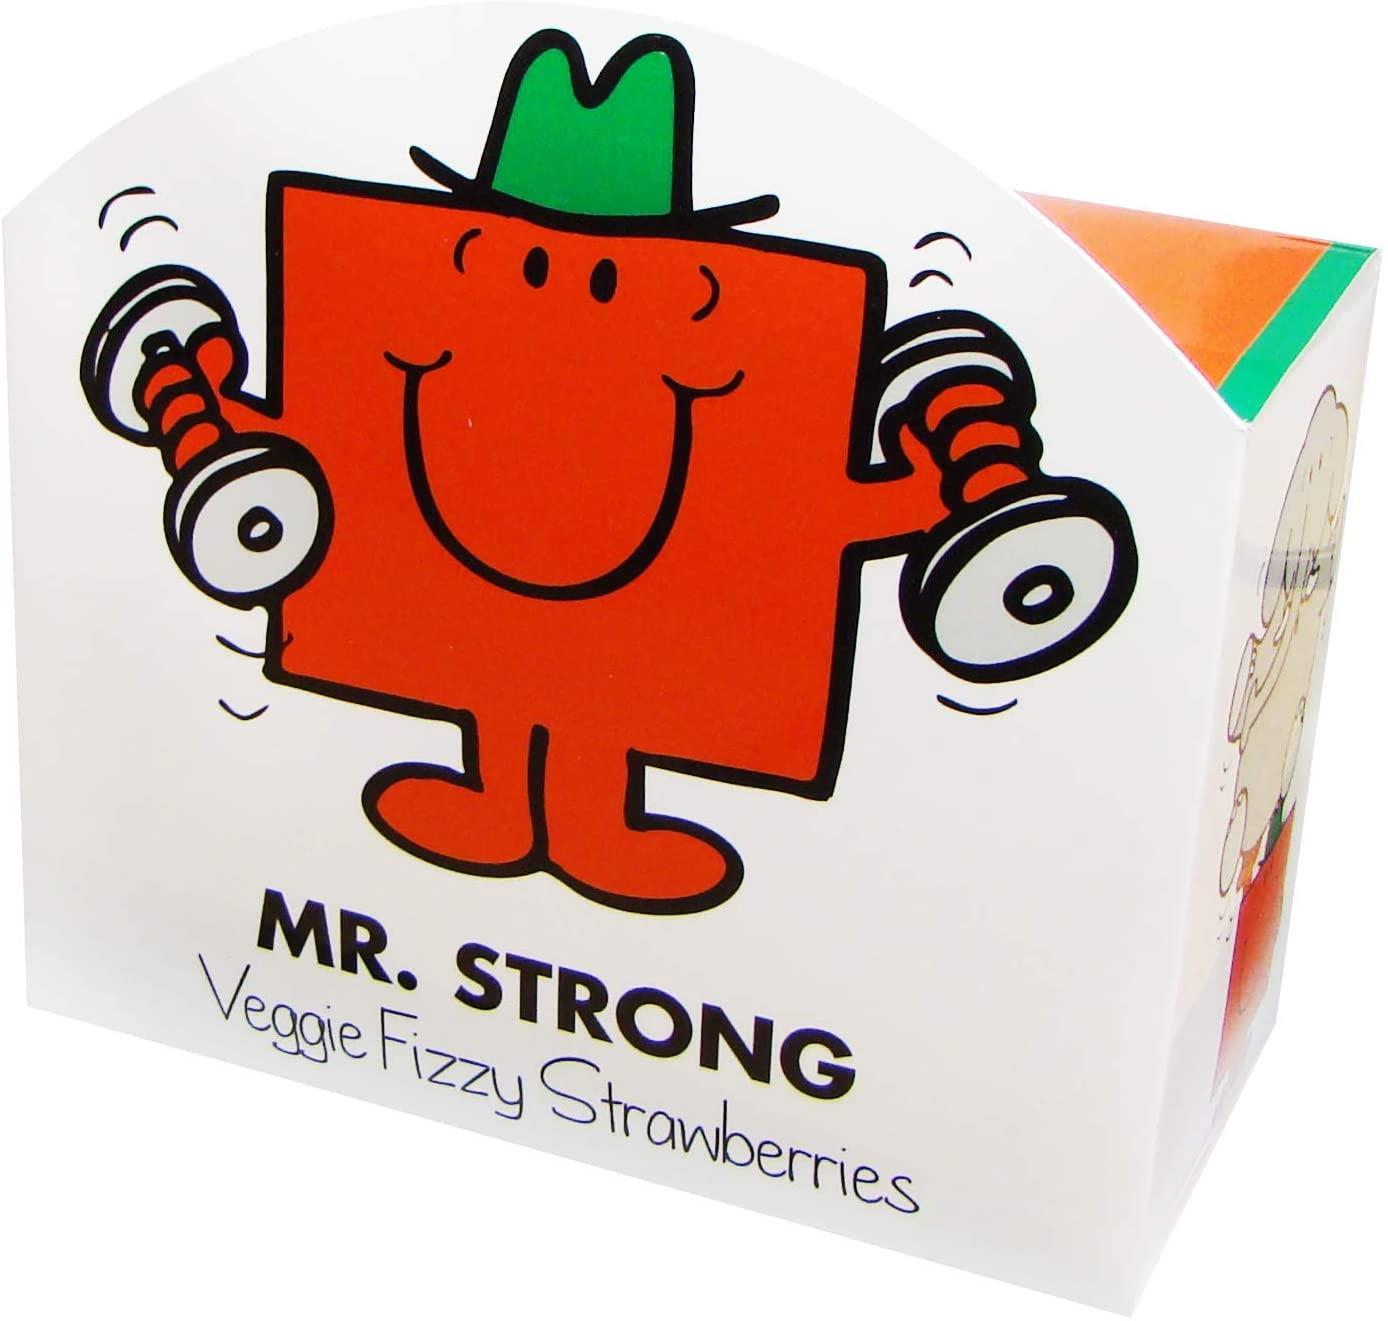 Mr Strong Veggie Fizzy Strawberries 140g